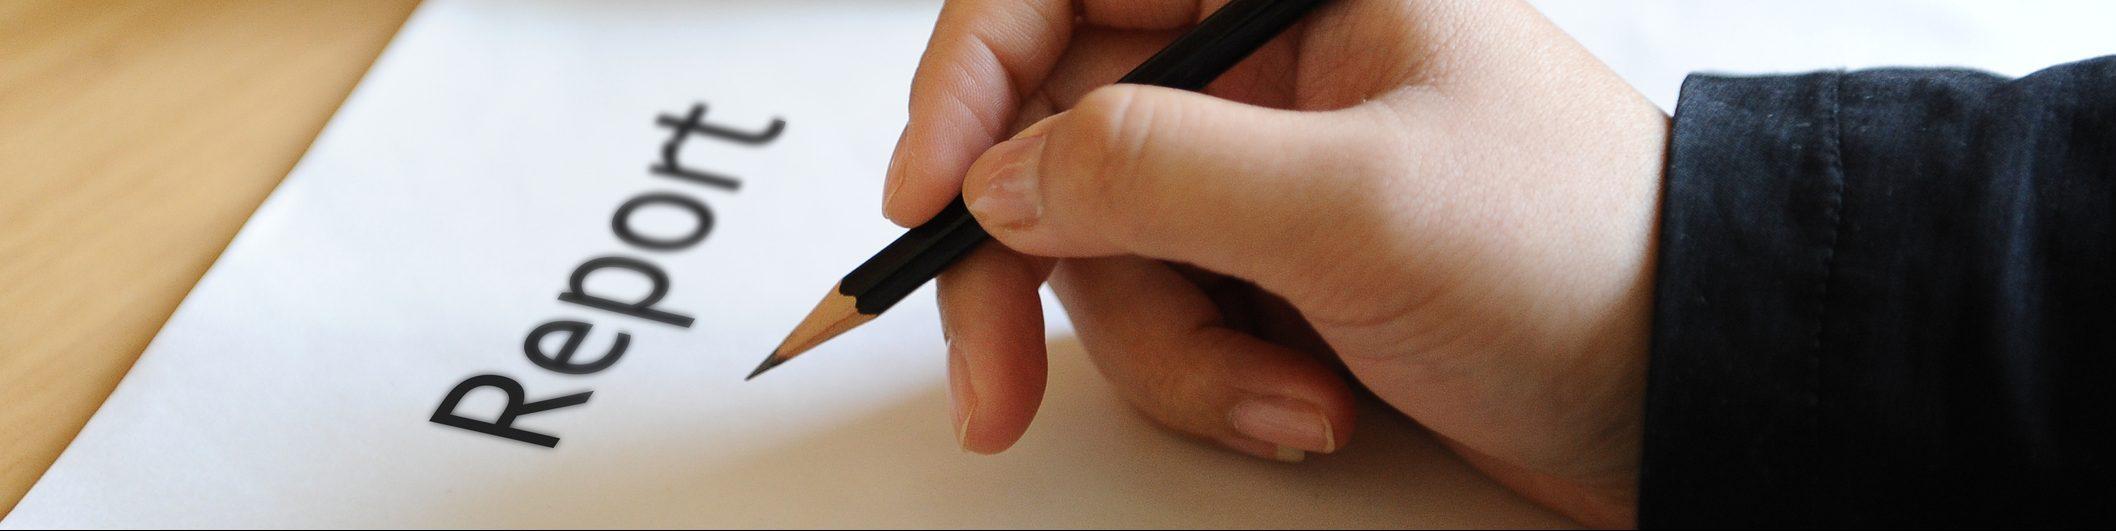 Professional report writing skills training